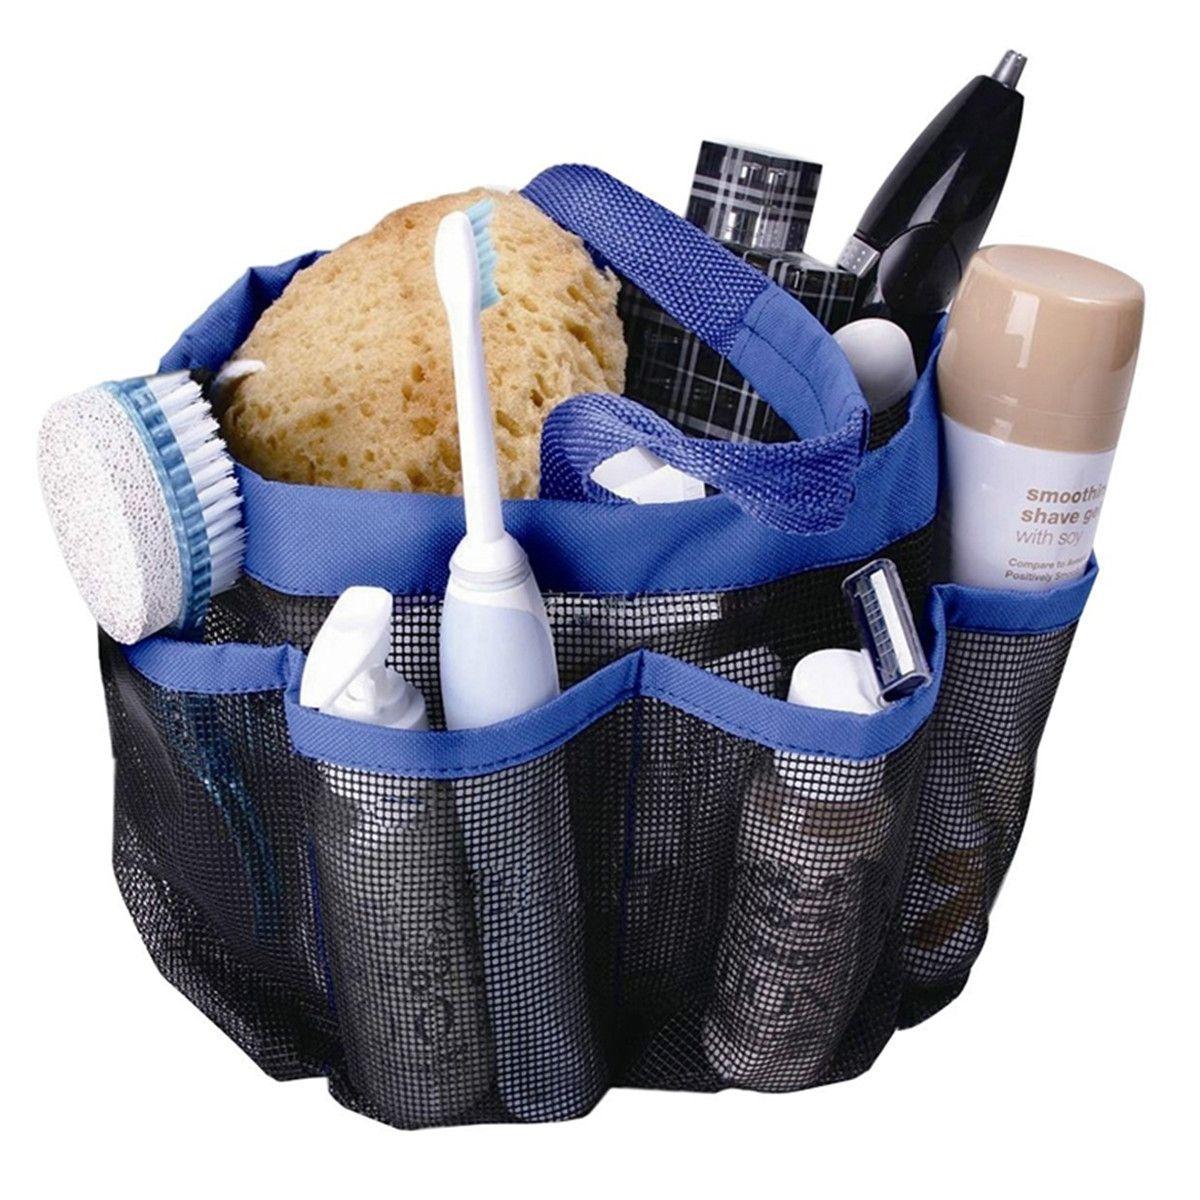 Waterproof Travel Shower Caddy | Bathroom Utensils | Pinterest ...